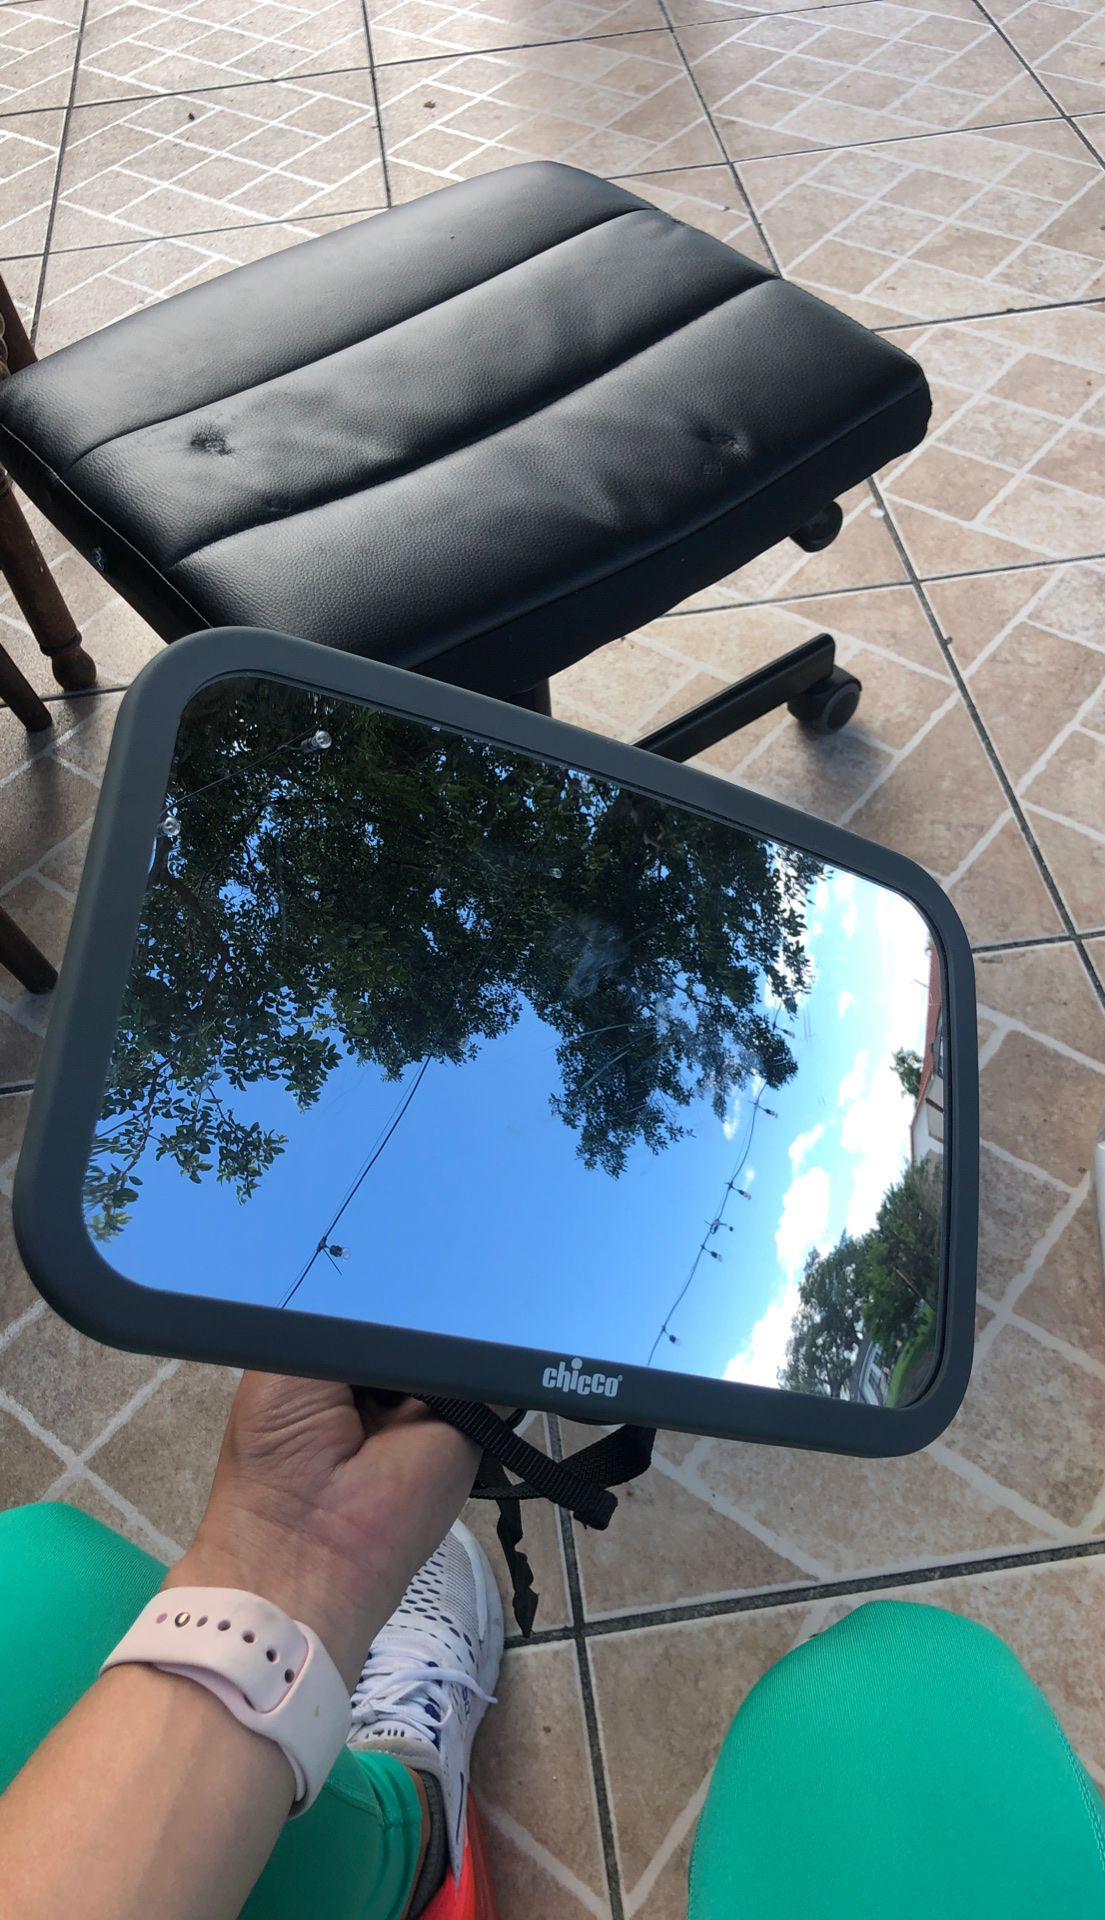 Chicco mirror